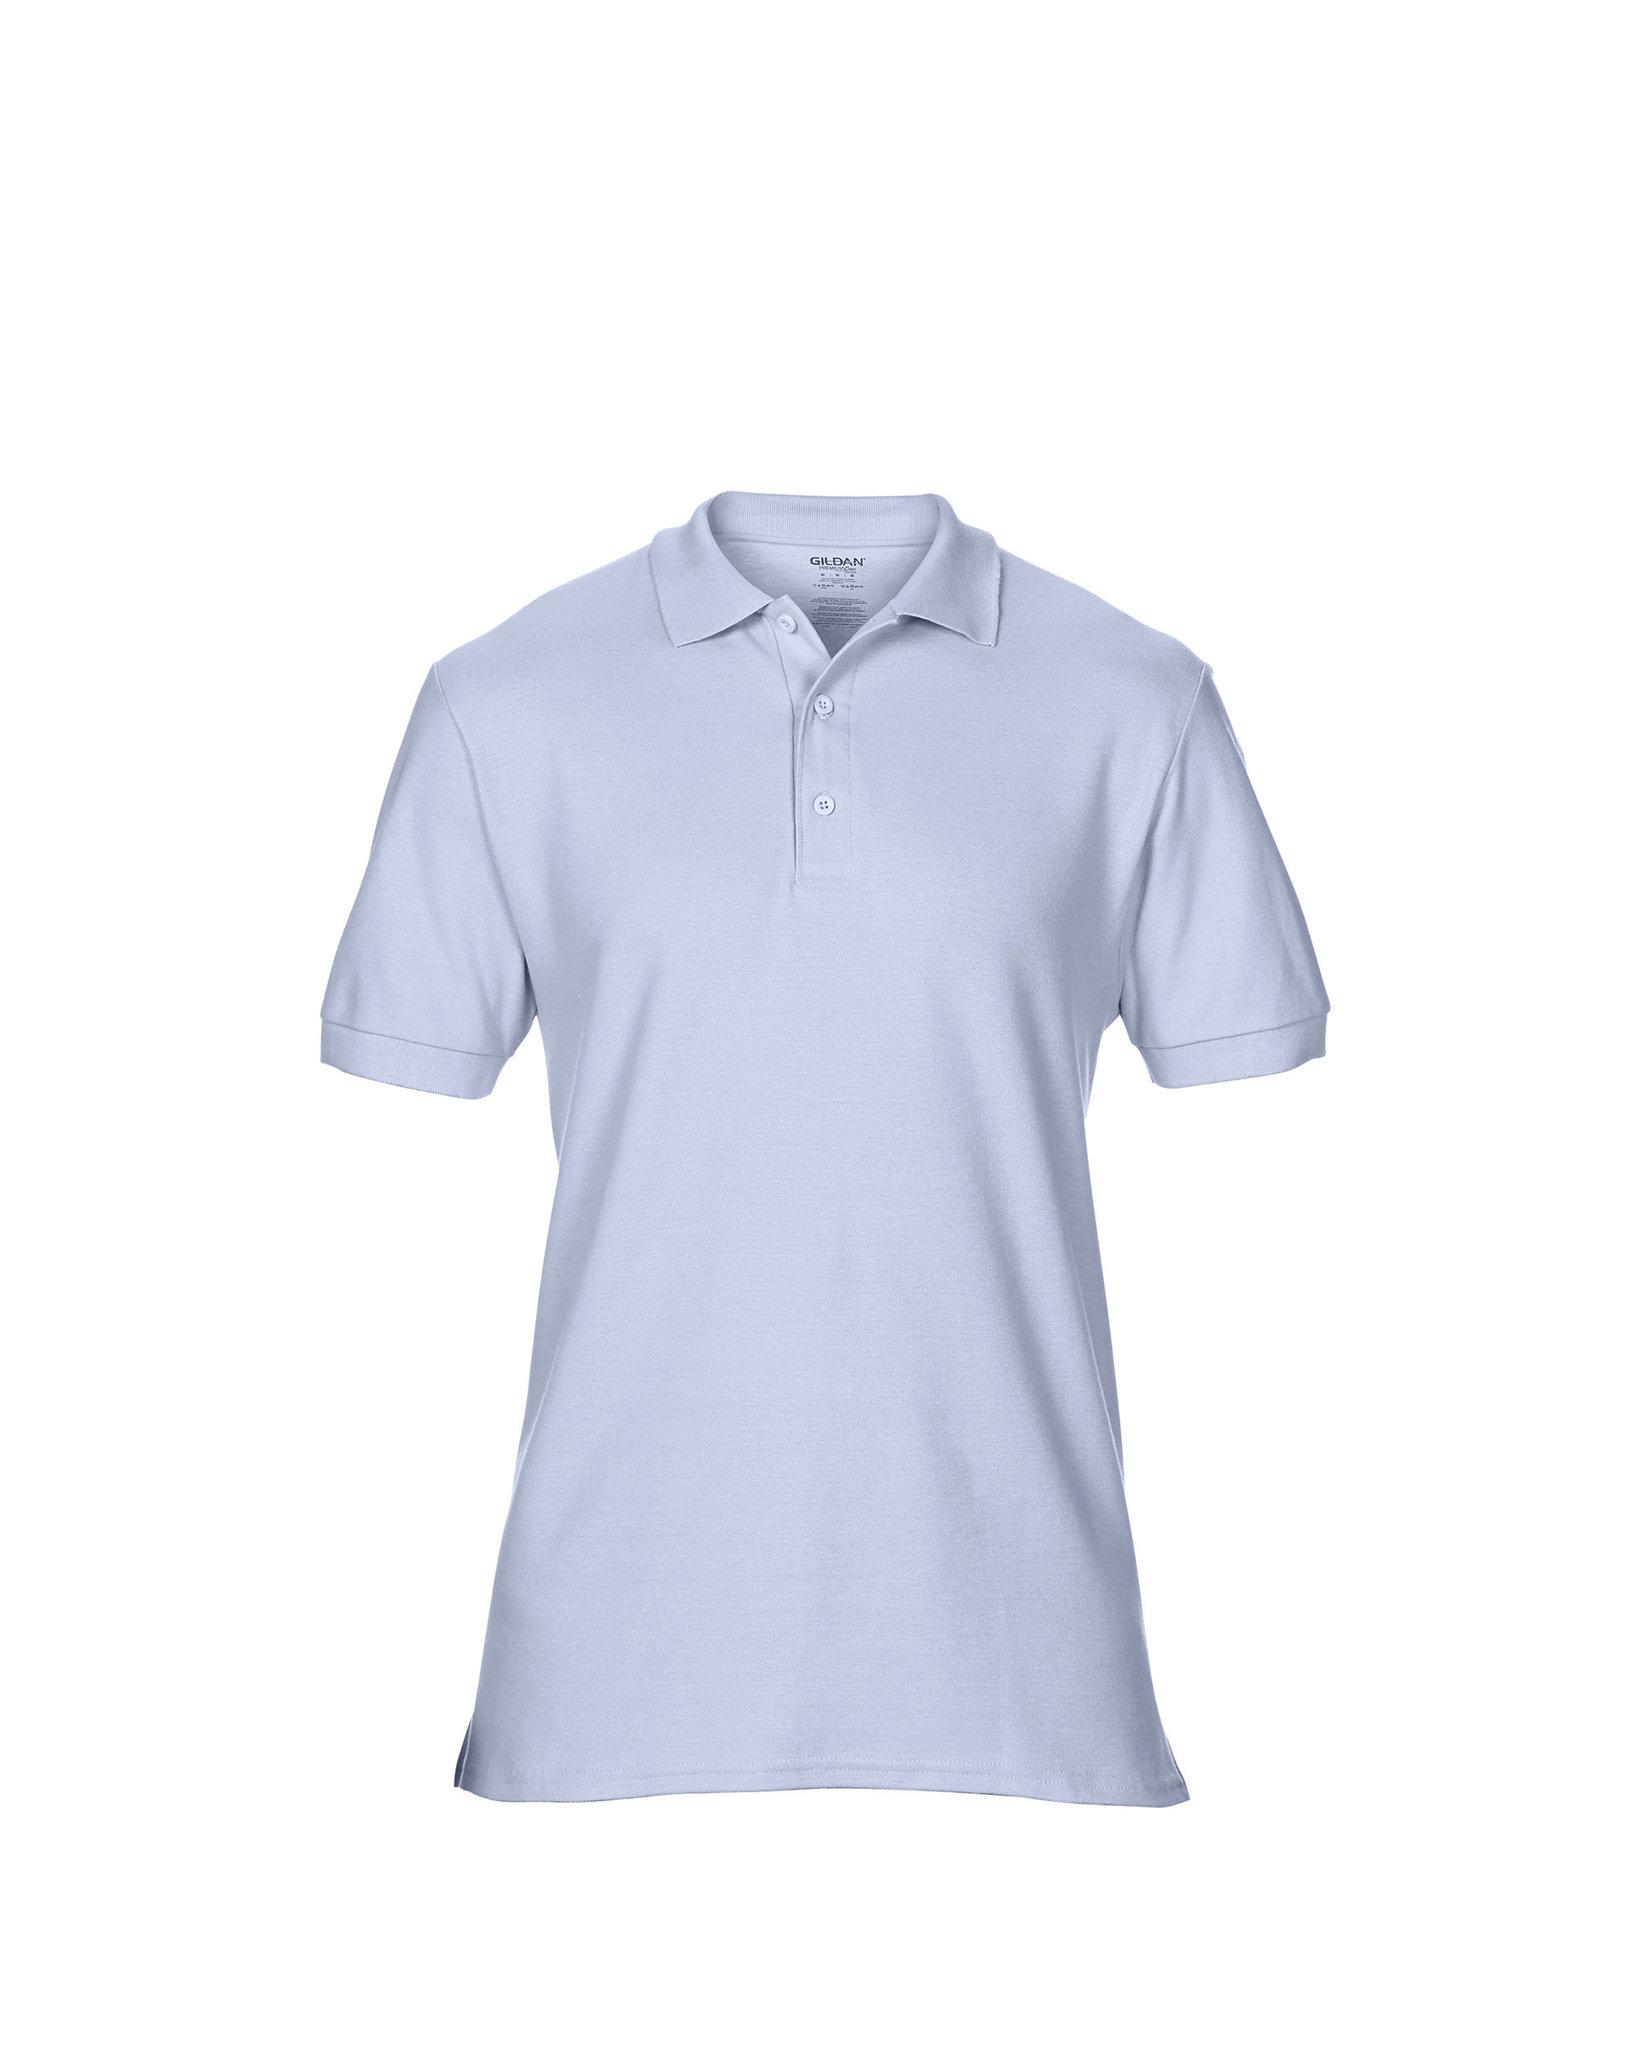 Polo personnalisable Dive blanc - polo personnalisable